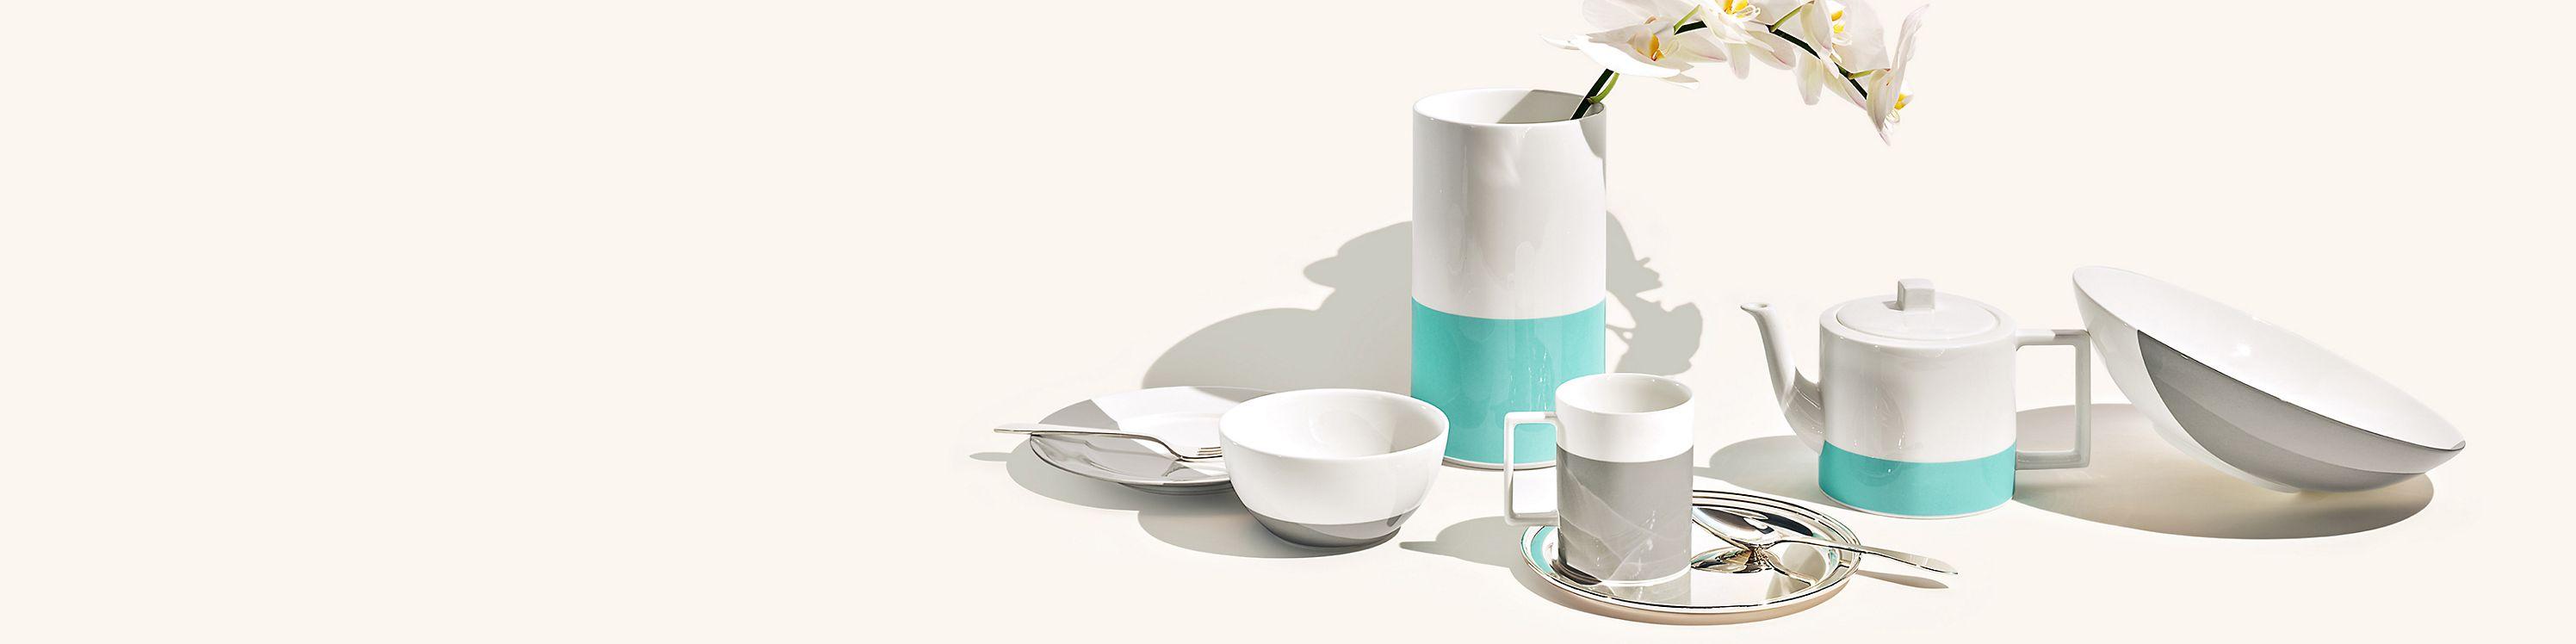 Table & Dinnerware